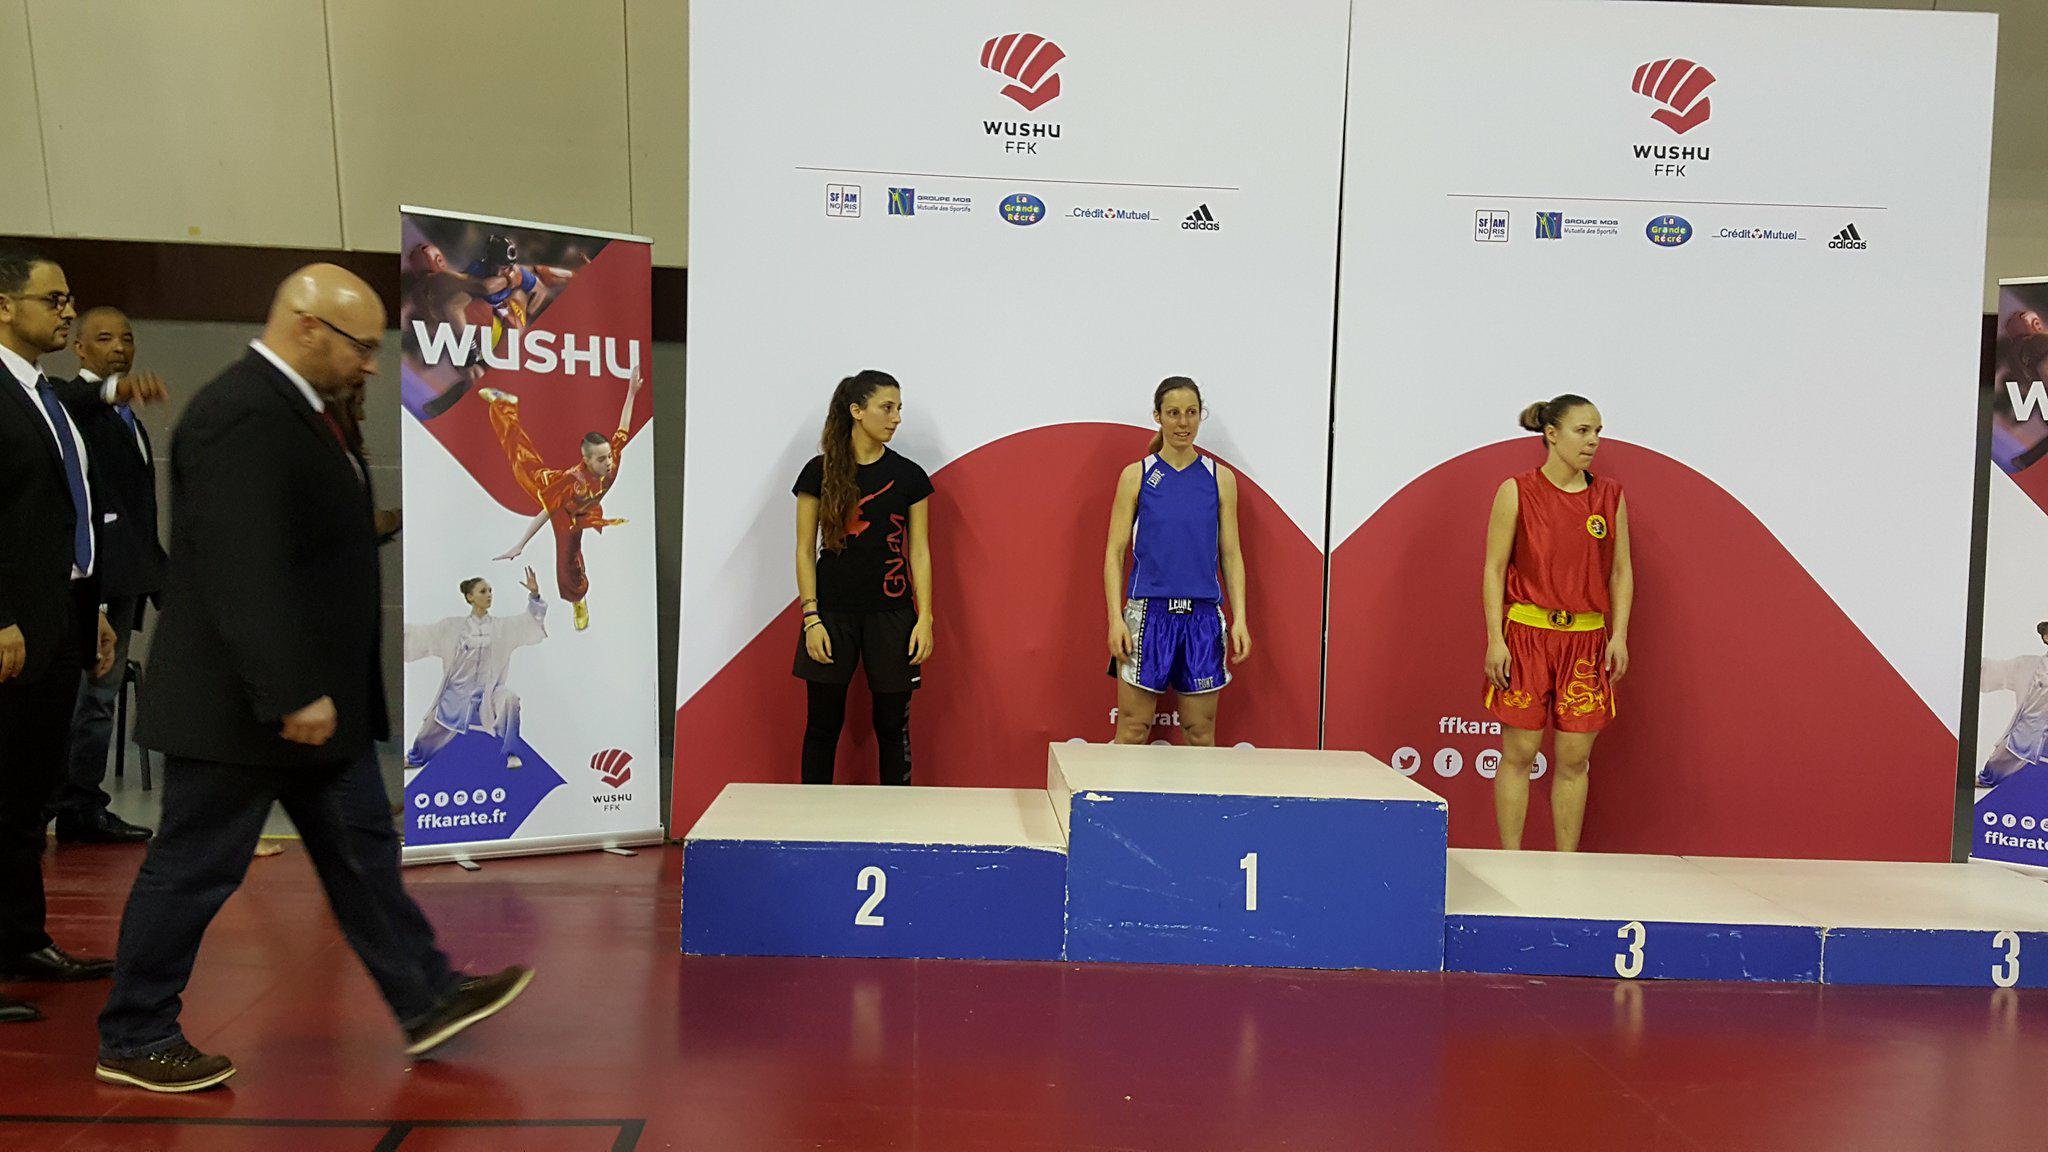 championnat france sanda 2018 marie-pierre Anstett barbarians fight wear elite - 56 kg michel anstett entraîneur